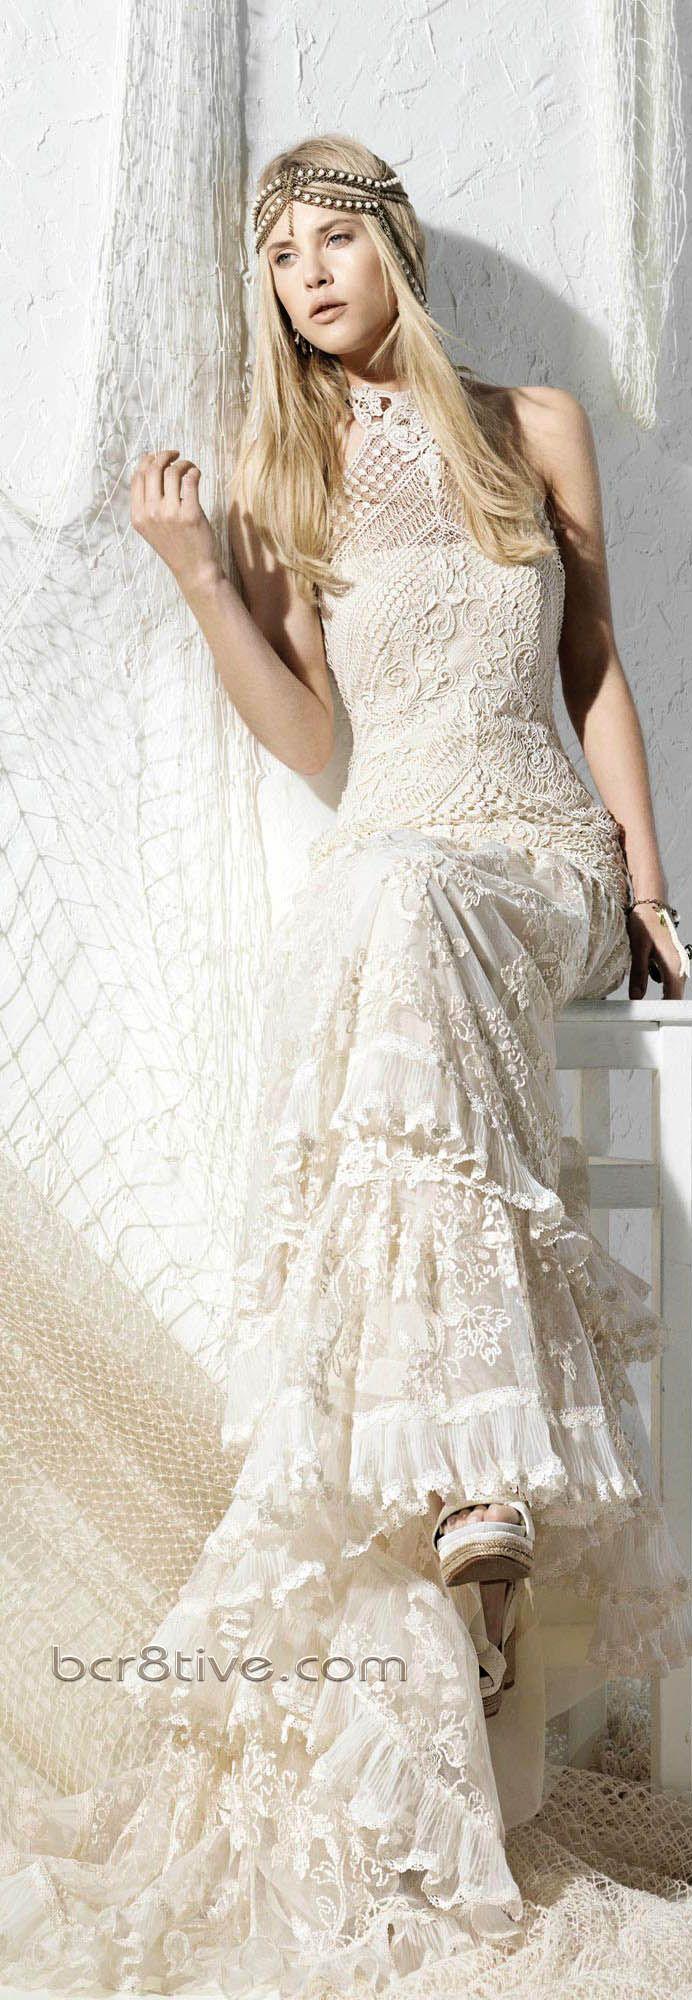 colores-de-boda-vestido-boho-chic-11